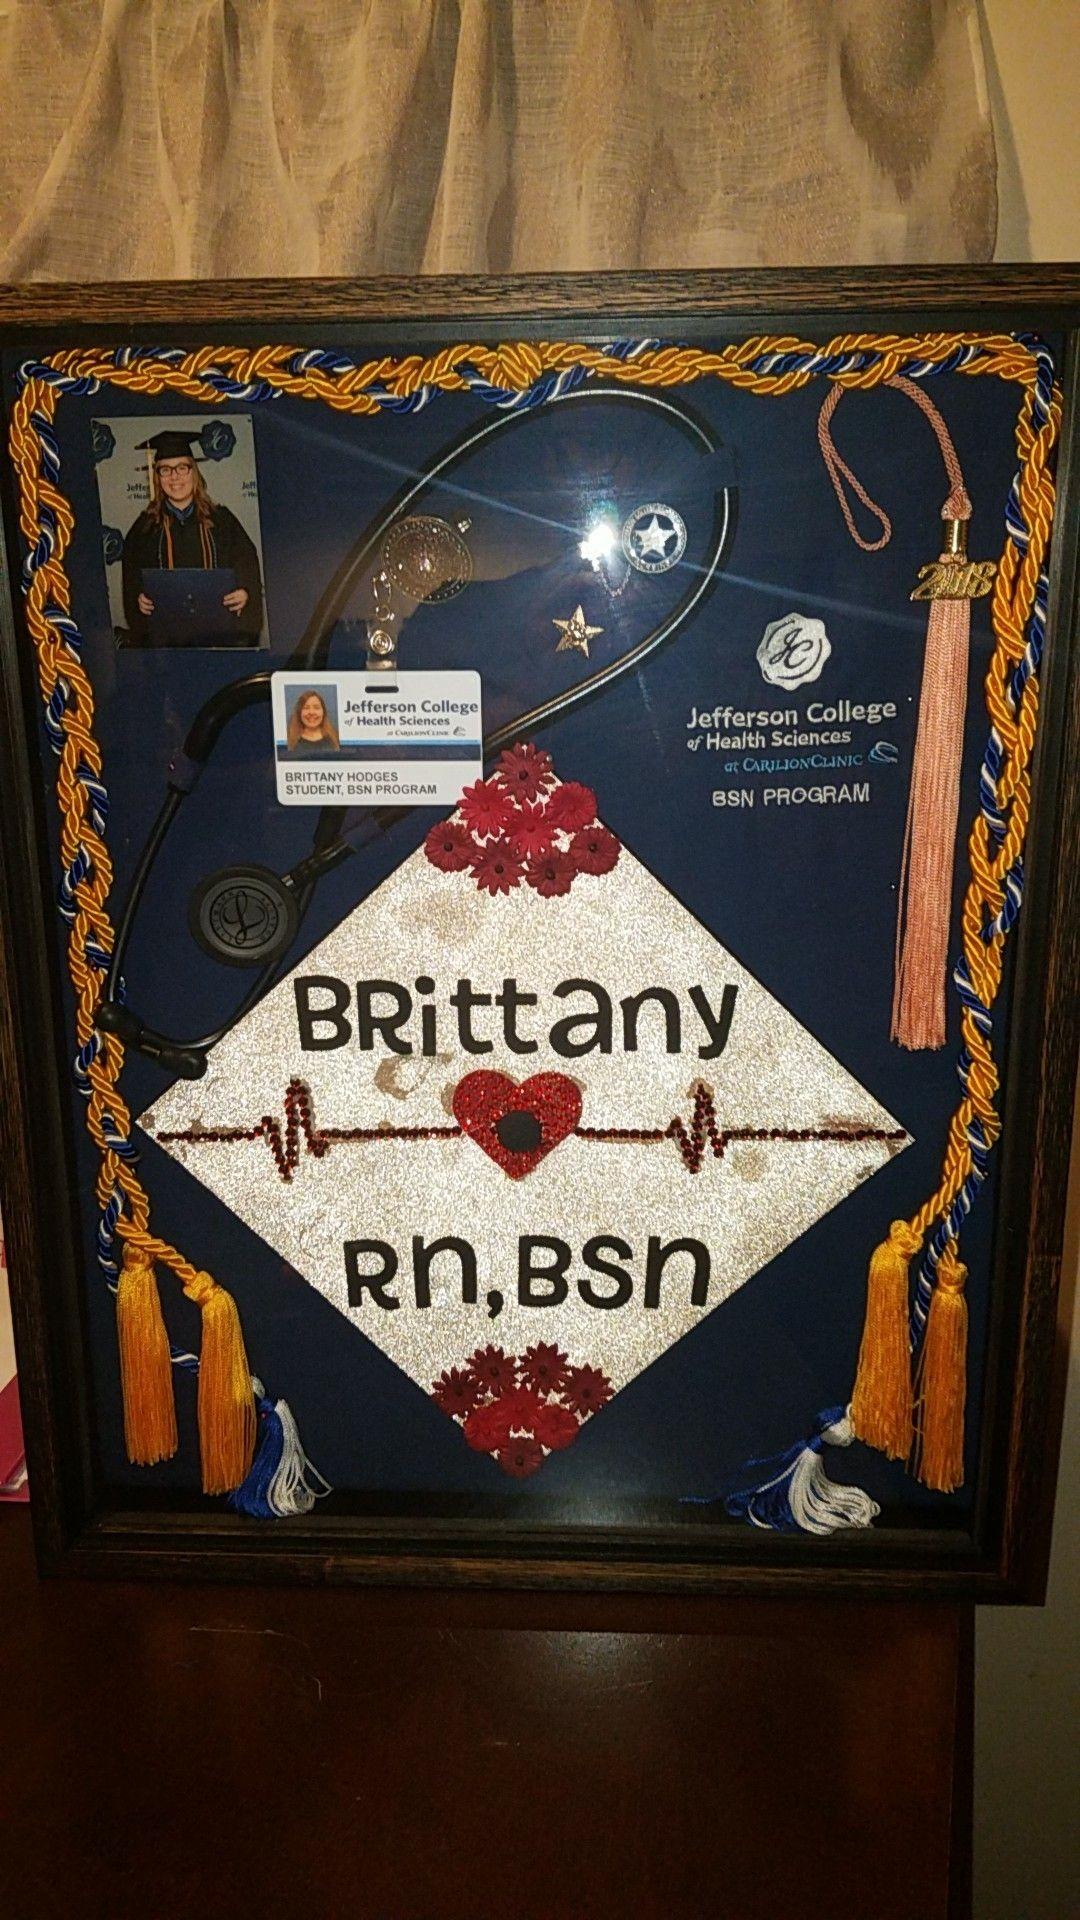 My Nursing School Shadow Box Thank You Hobby Lobby And Michael S Shadow Box Graduation Nurse Graduation Cap Nursing School Graduation